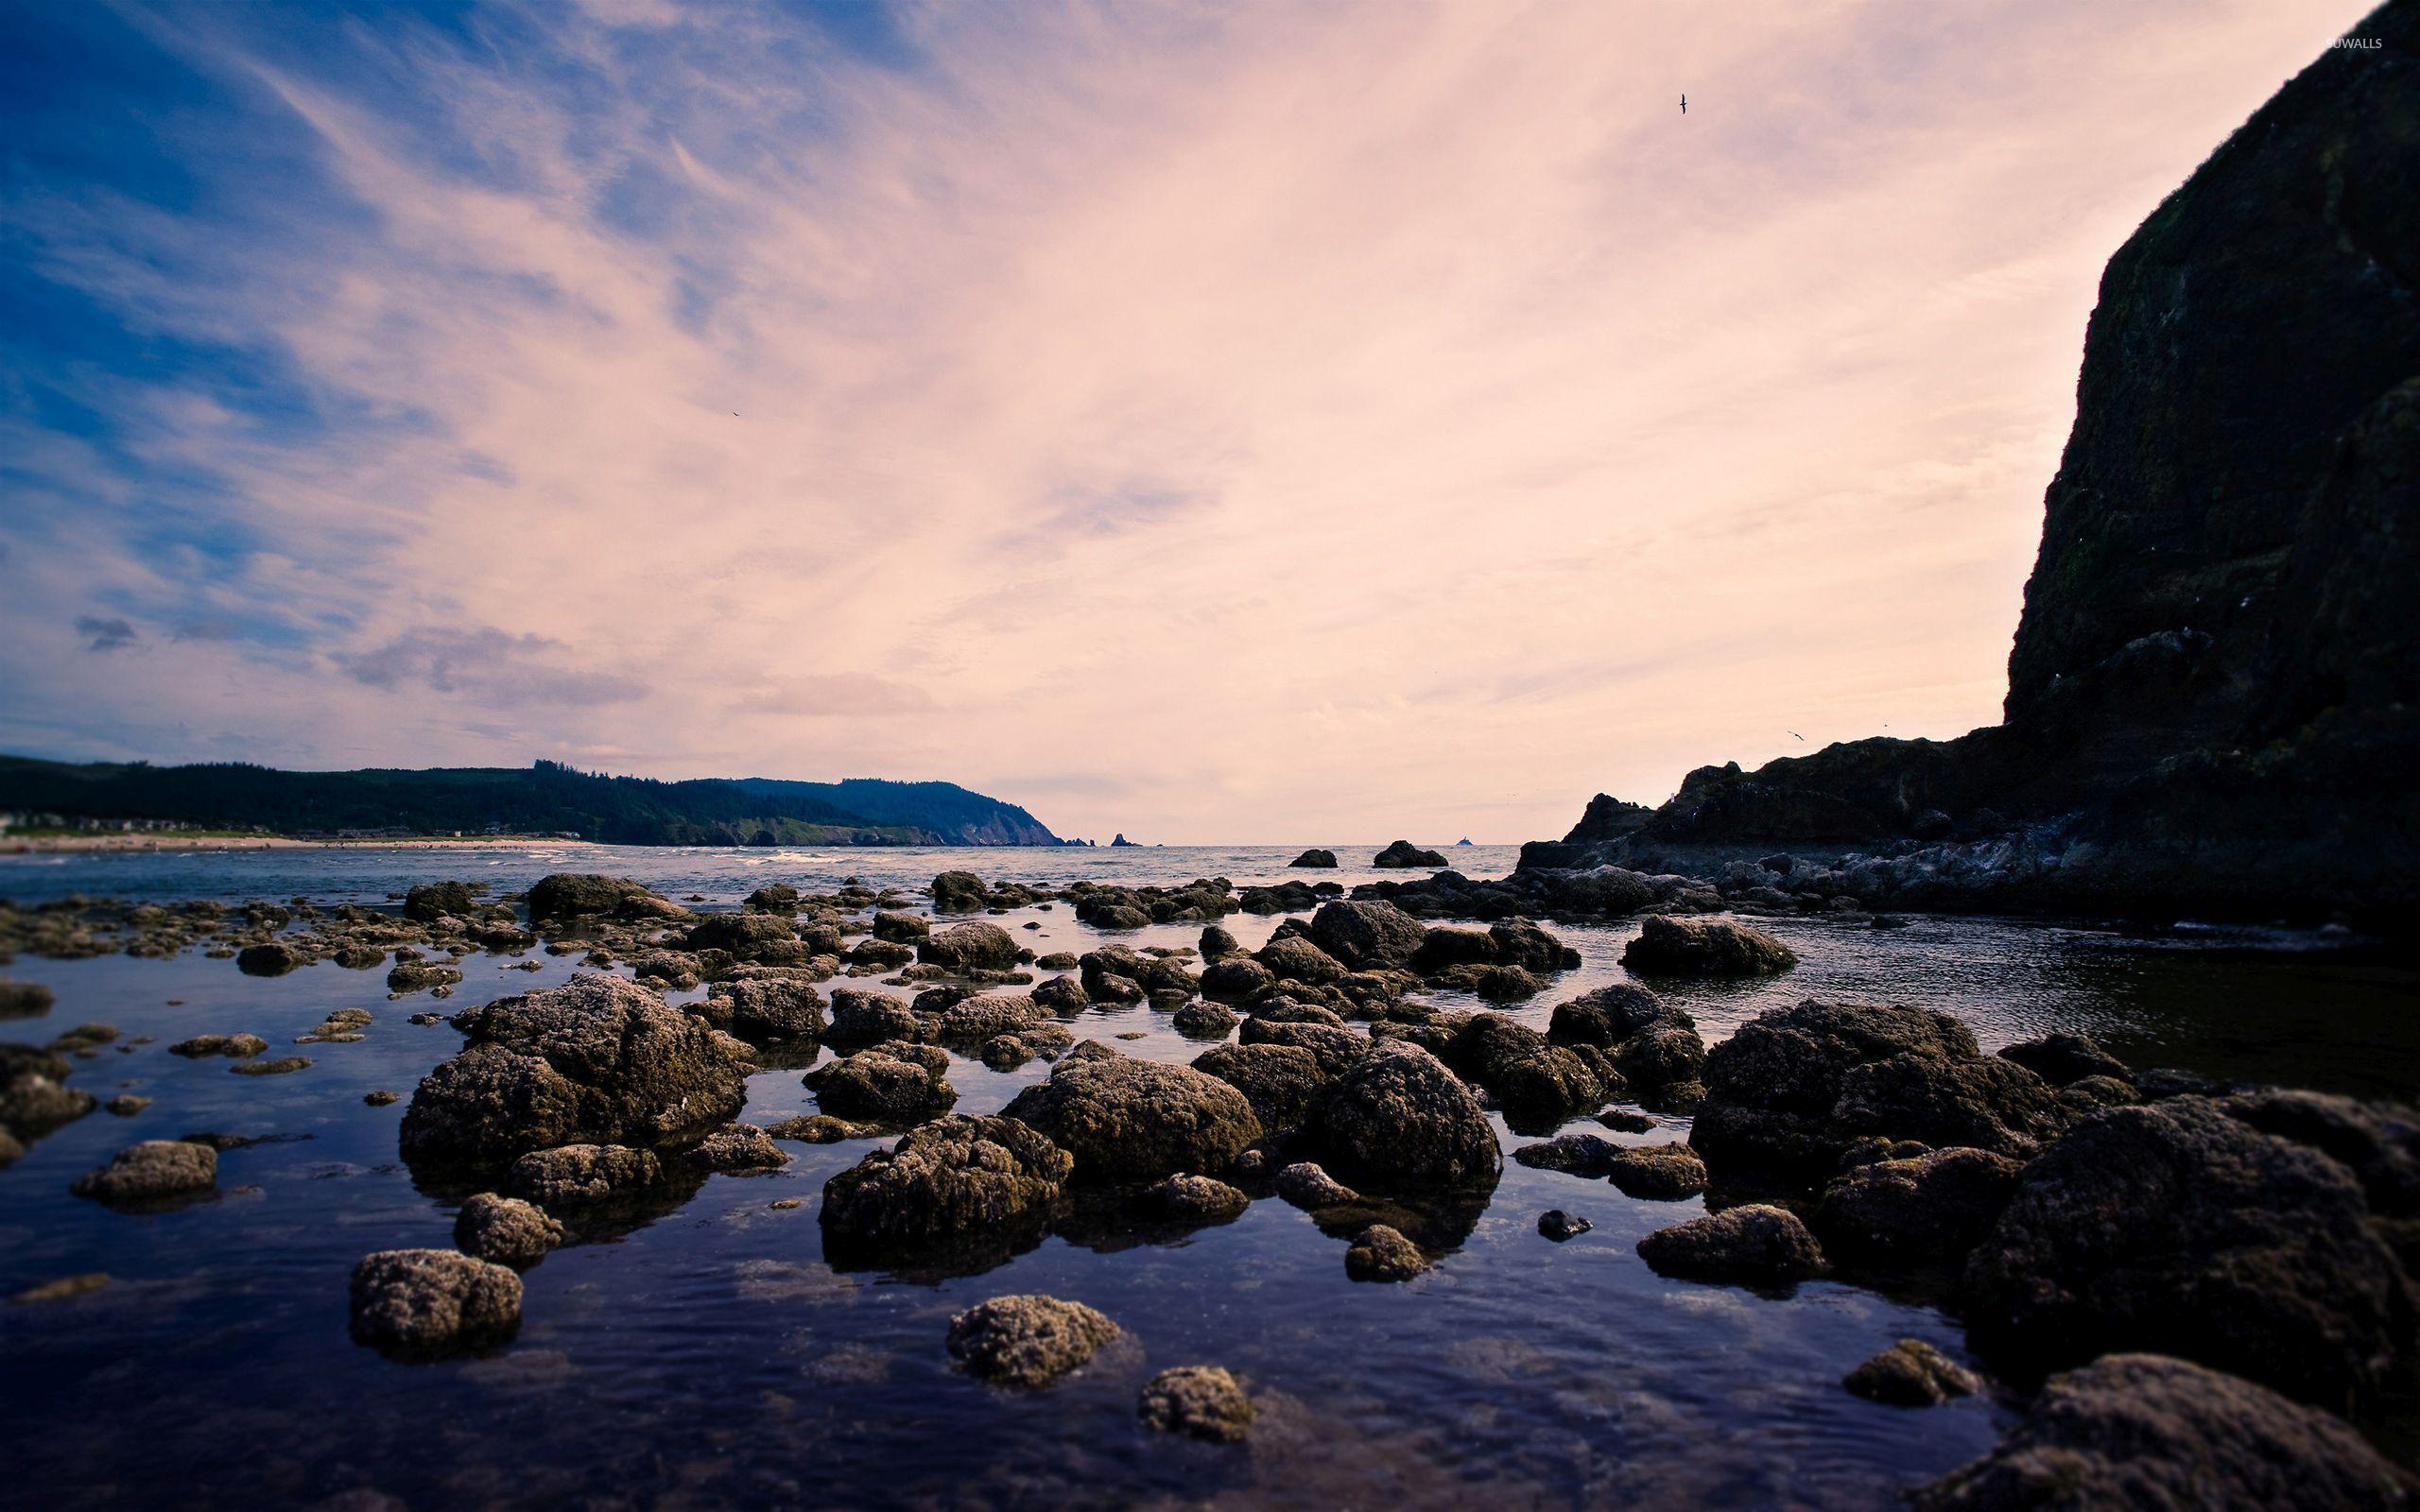 Rocks On The Muddy Ocean Beach Wallpaper Beach Wallpapers